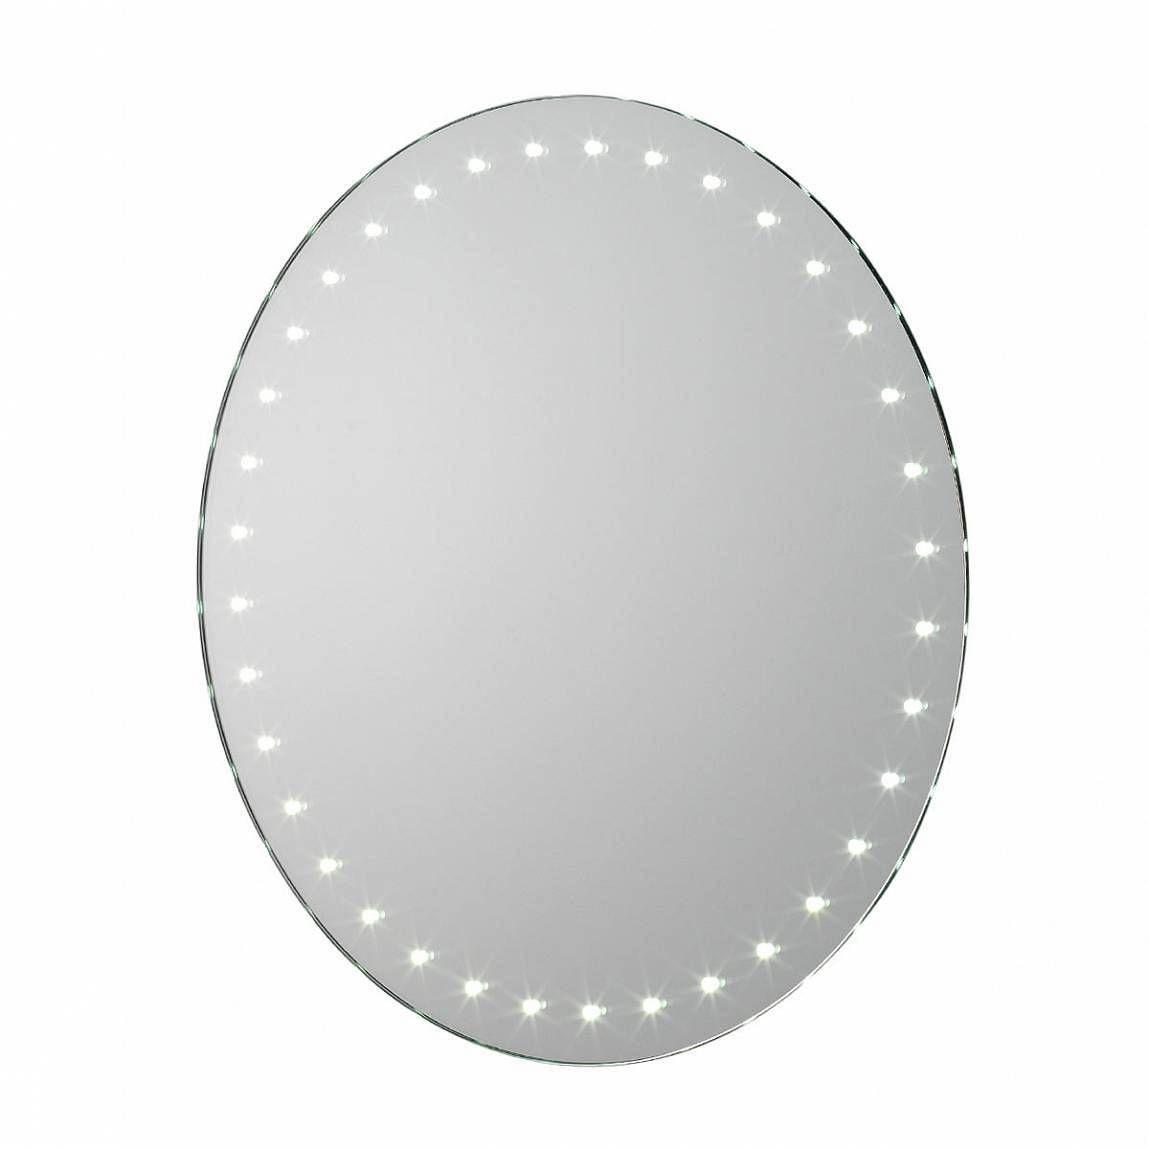 Image of Aries LED Round Mirror